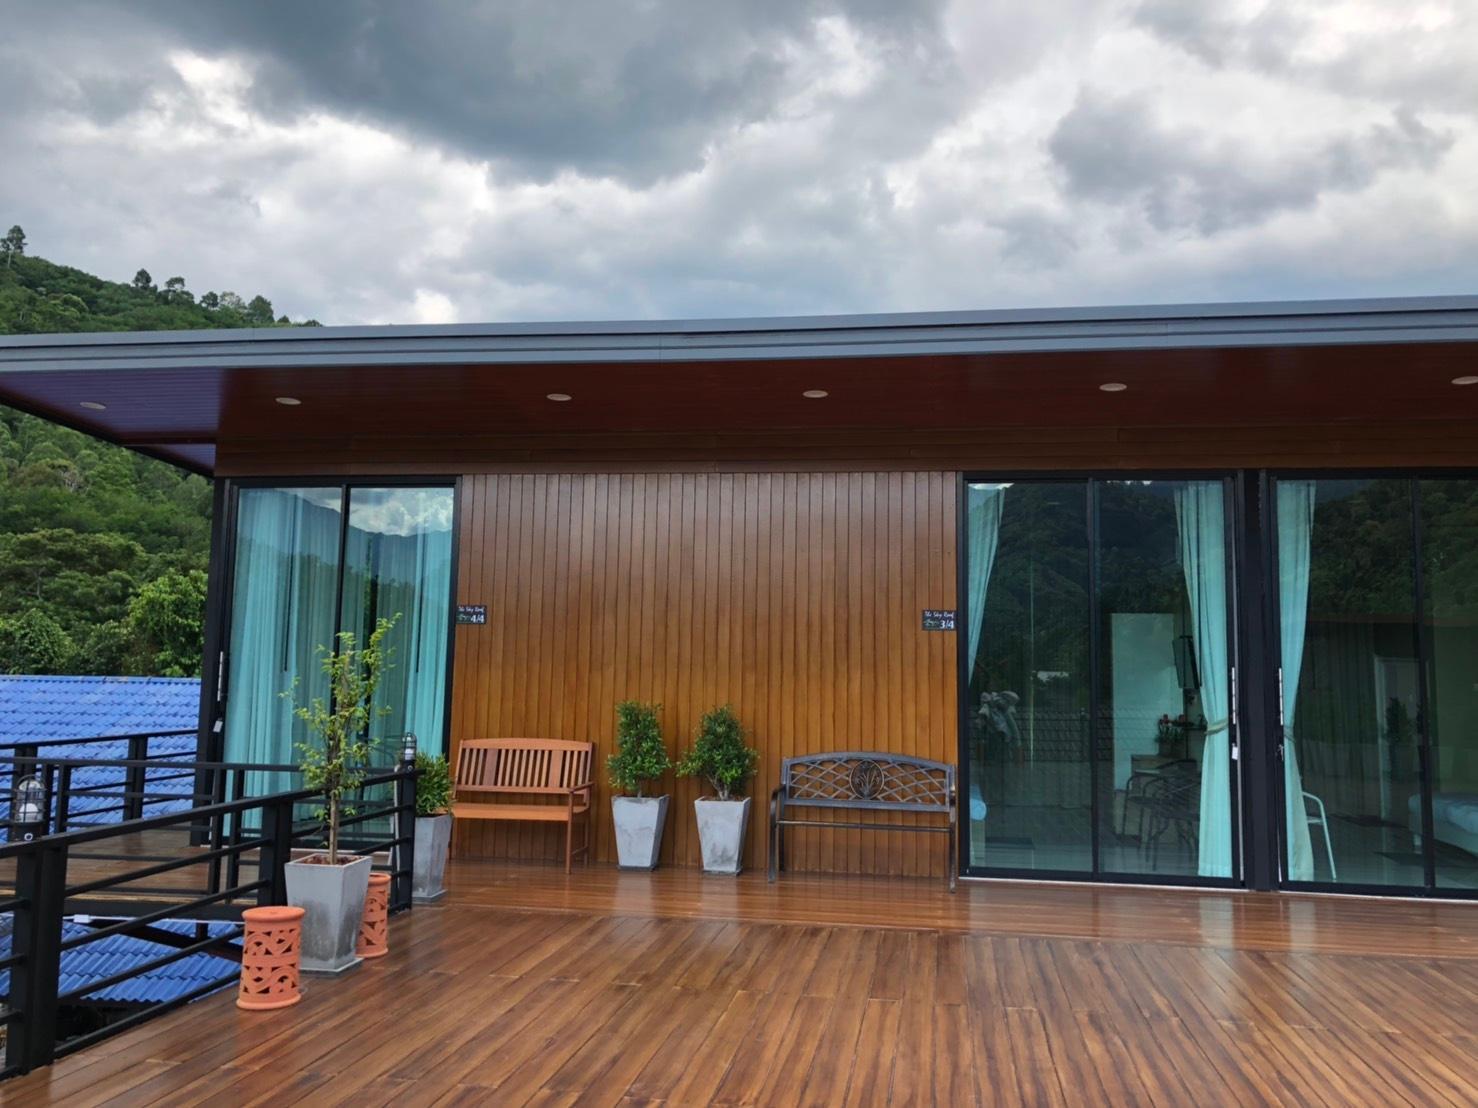 The Sky Roof Homestay @ Kiriwong เดอะ สกายรูฟ โฮมสเตย์ แอท คีรีวง